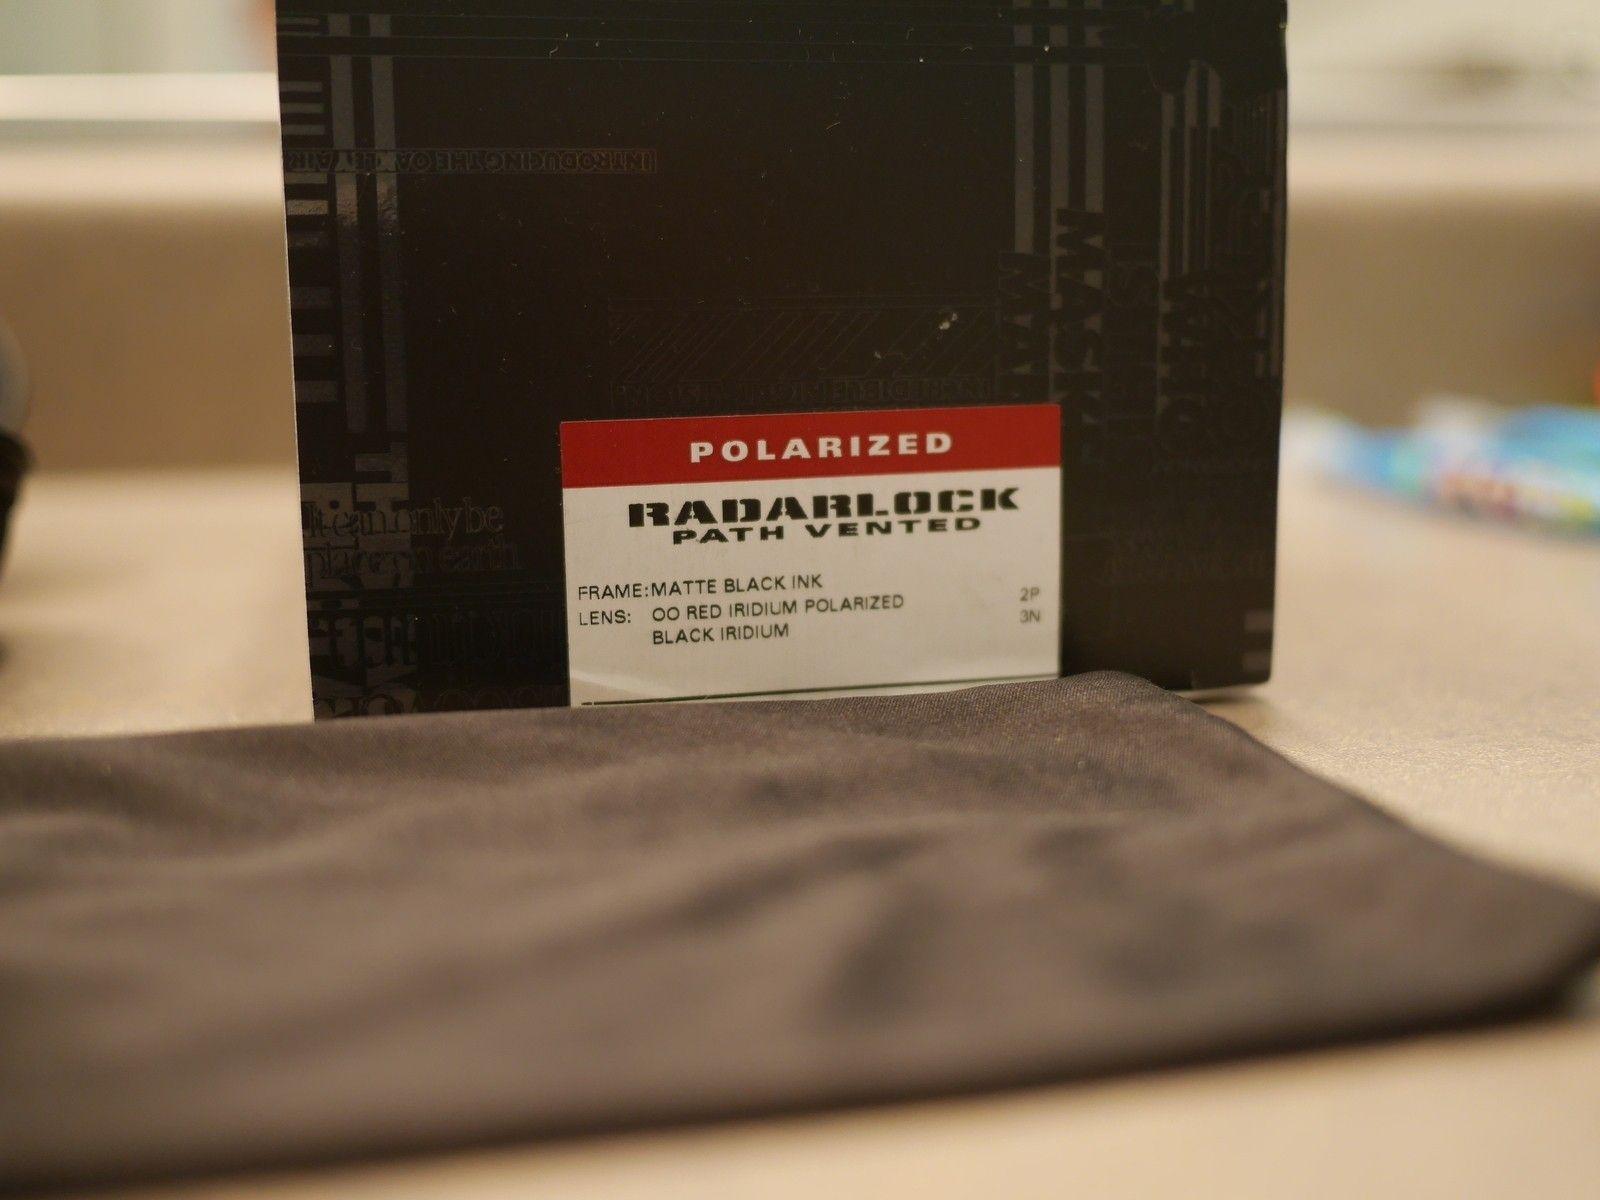 Radarlock Path Bundle (prizm,polarized) - P1230261.JPG